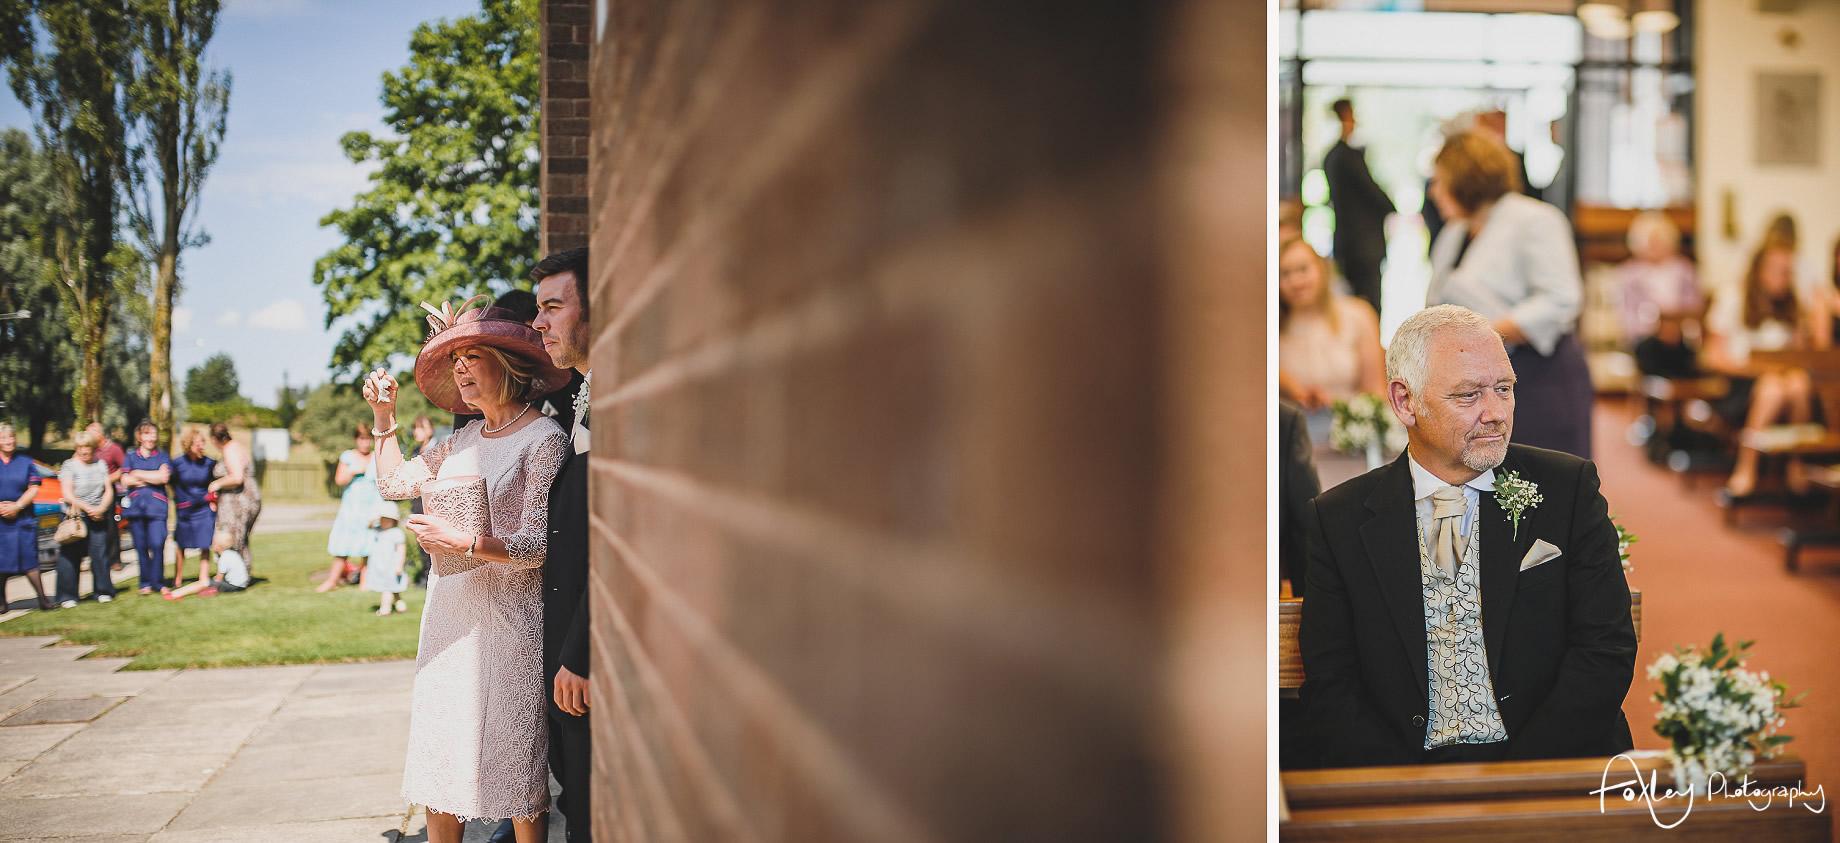 Rebecca and Dan Wedding at Preston Marriott Hotel 042